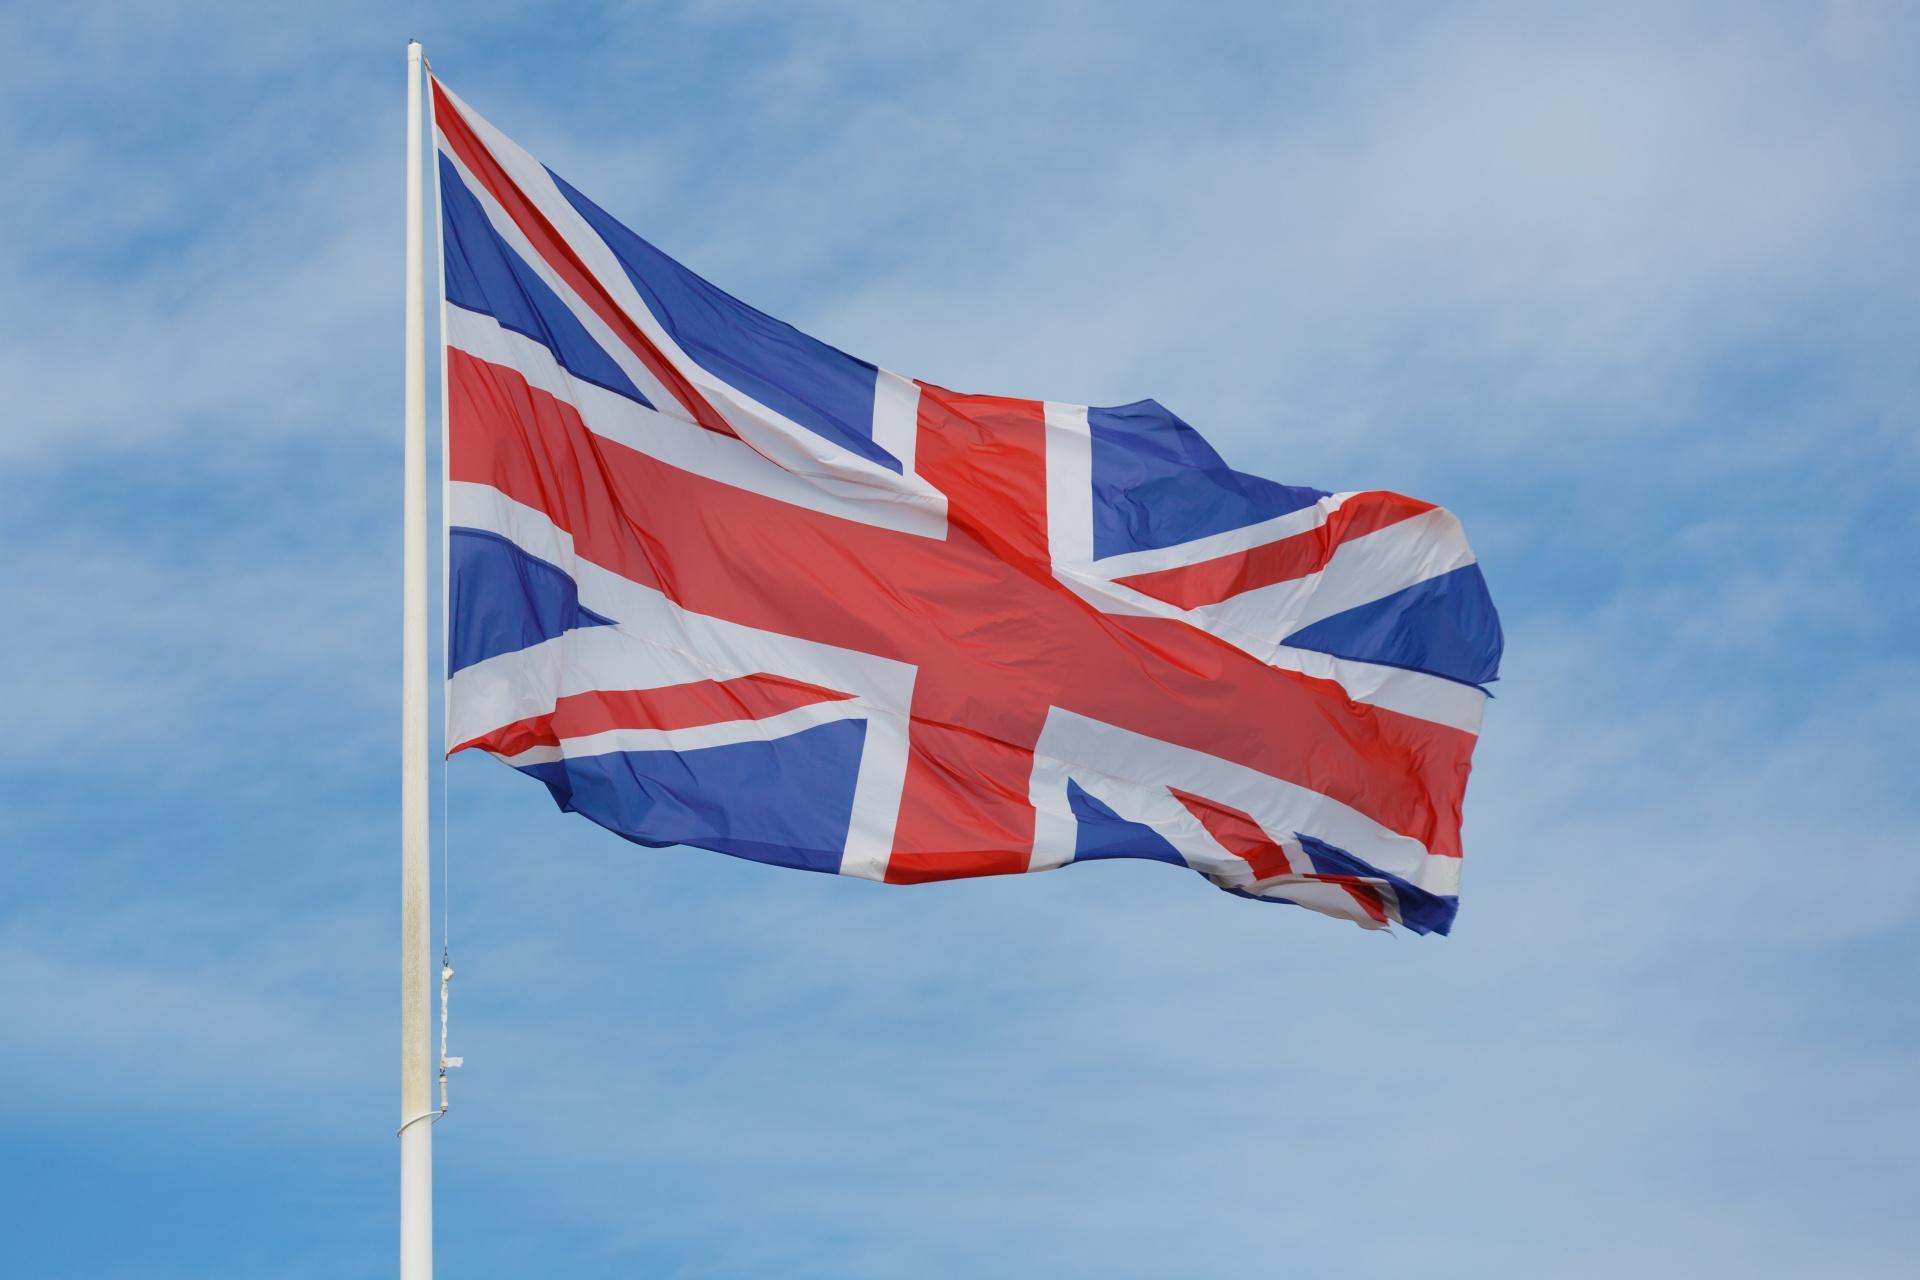 british-flag-in-the-sky-1443282351DLv.jpg